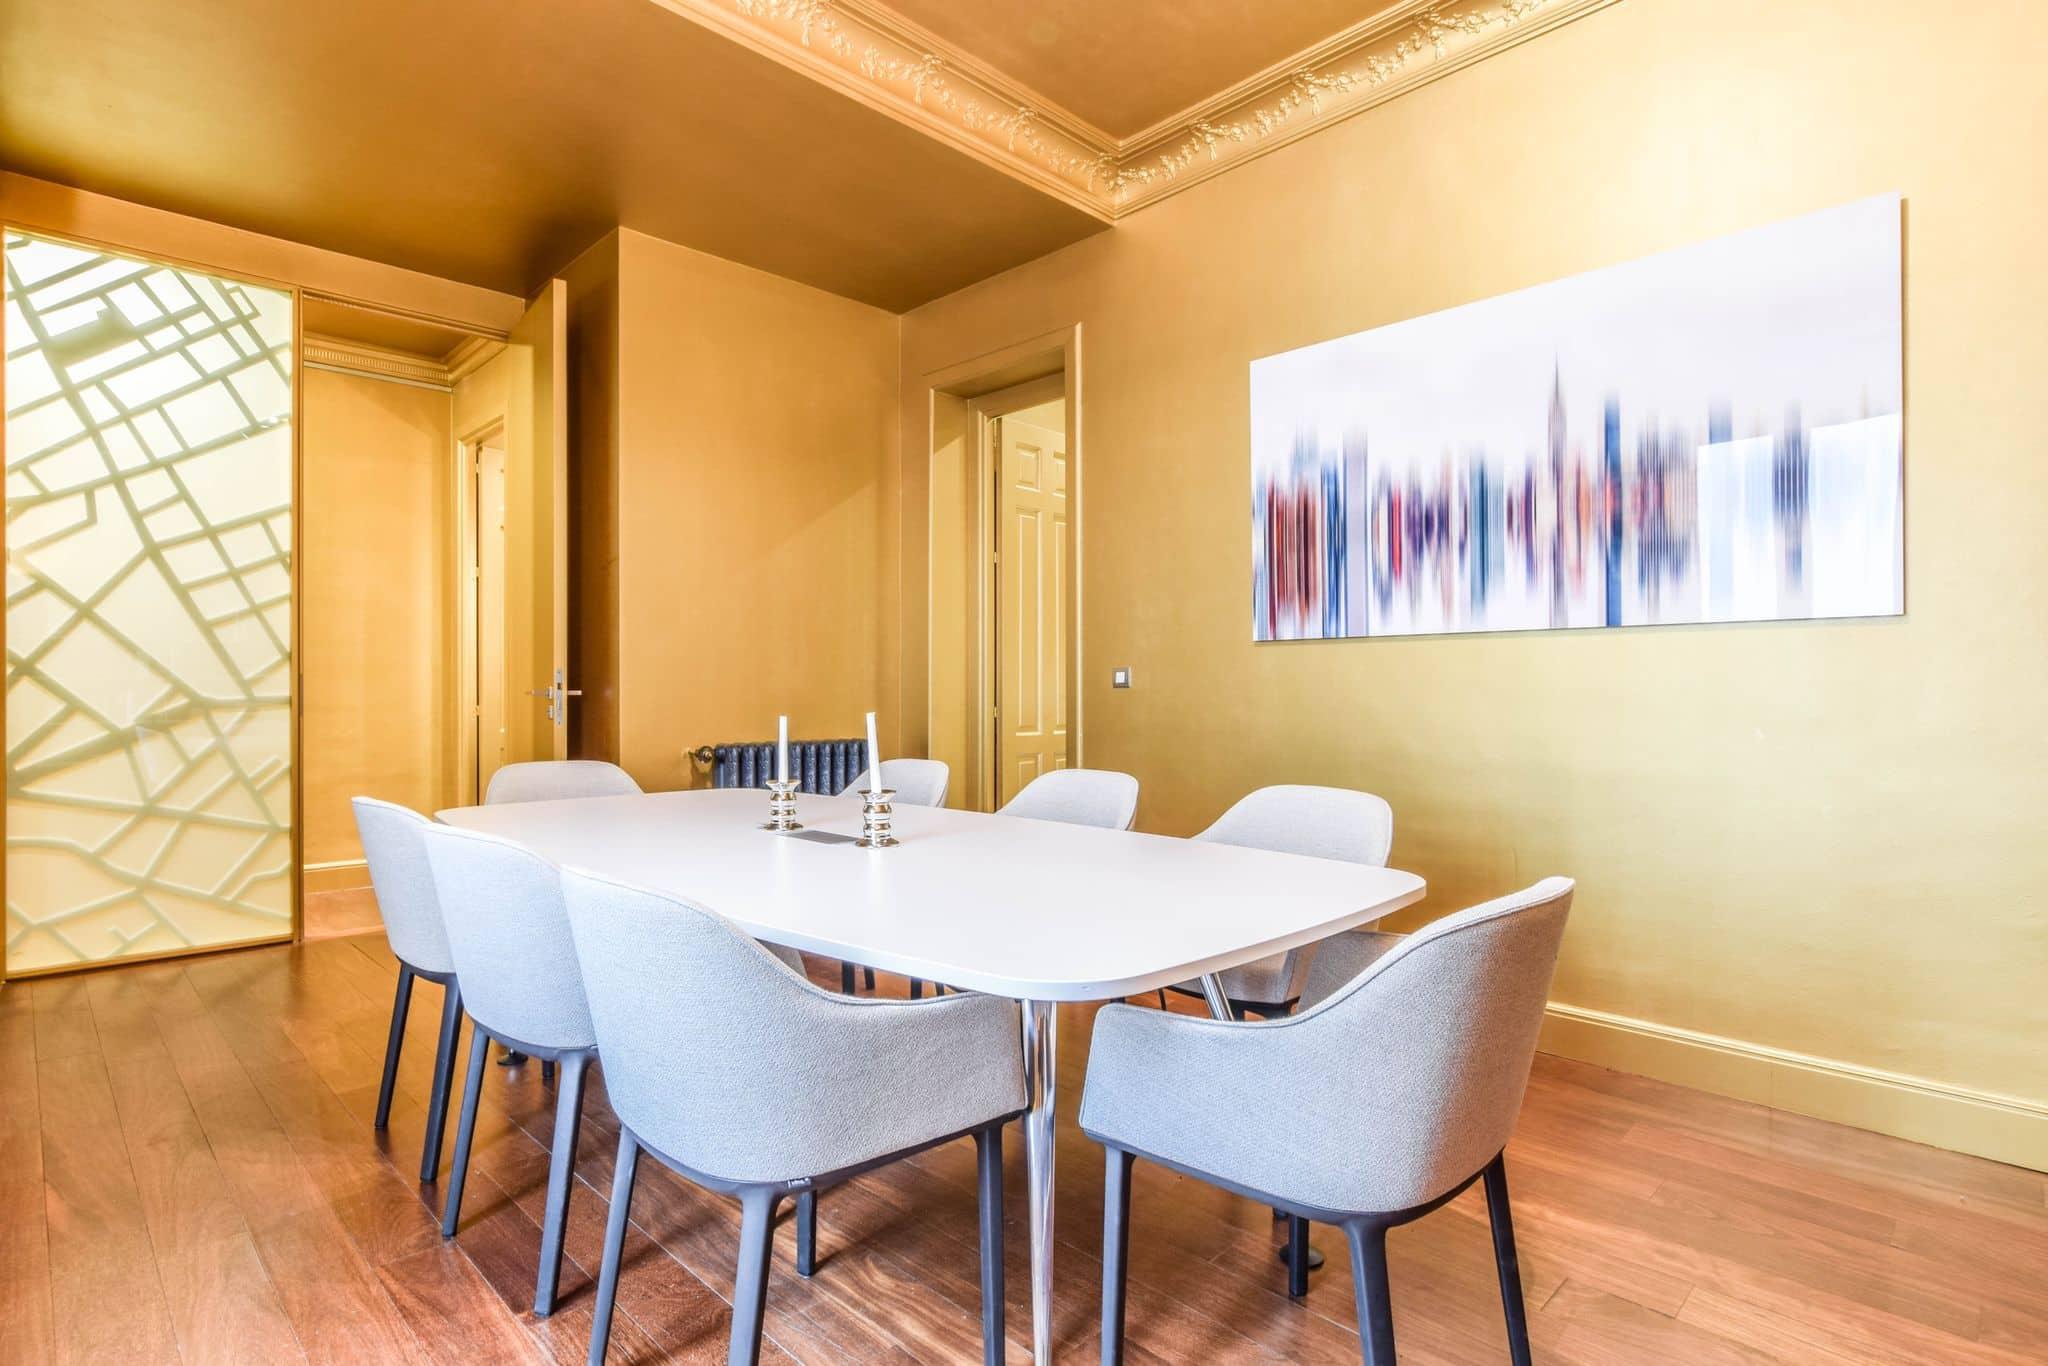 Borad Meeting Room in Madrid city